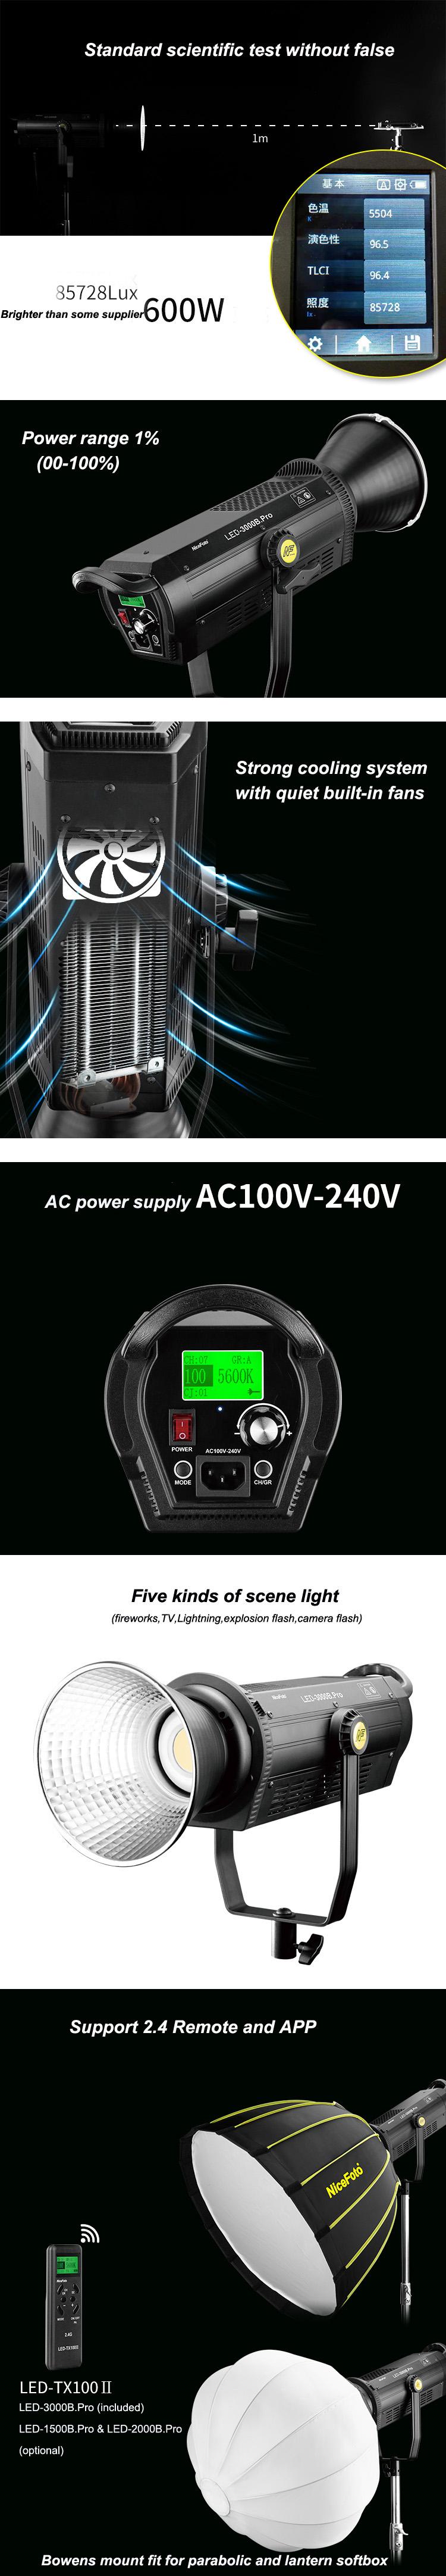 LED-3000B.Pro  NiceFoto 300W Professional LED Video Light film light photographic Equipment studio lighting 5600K